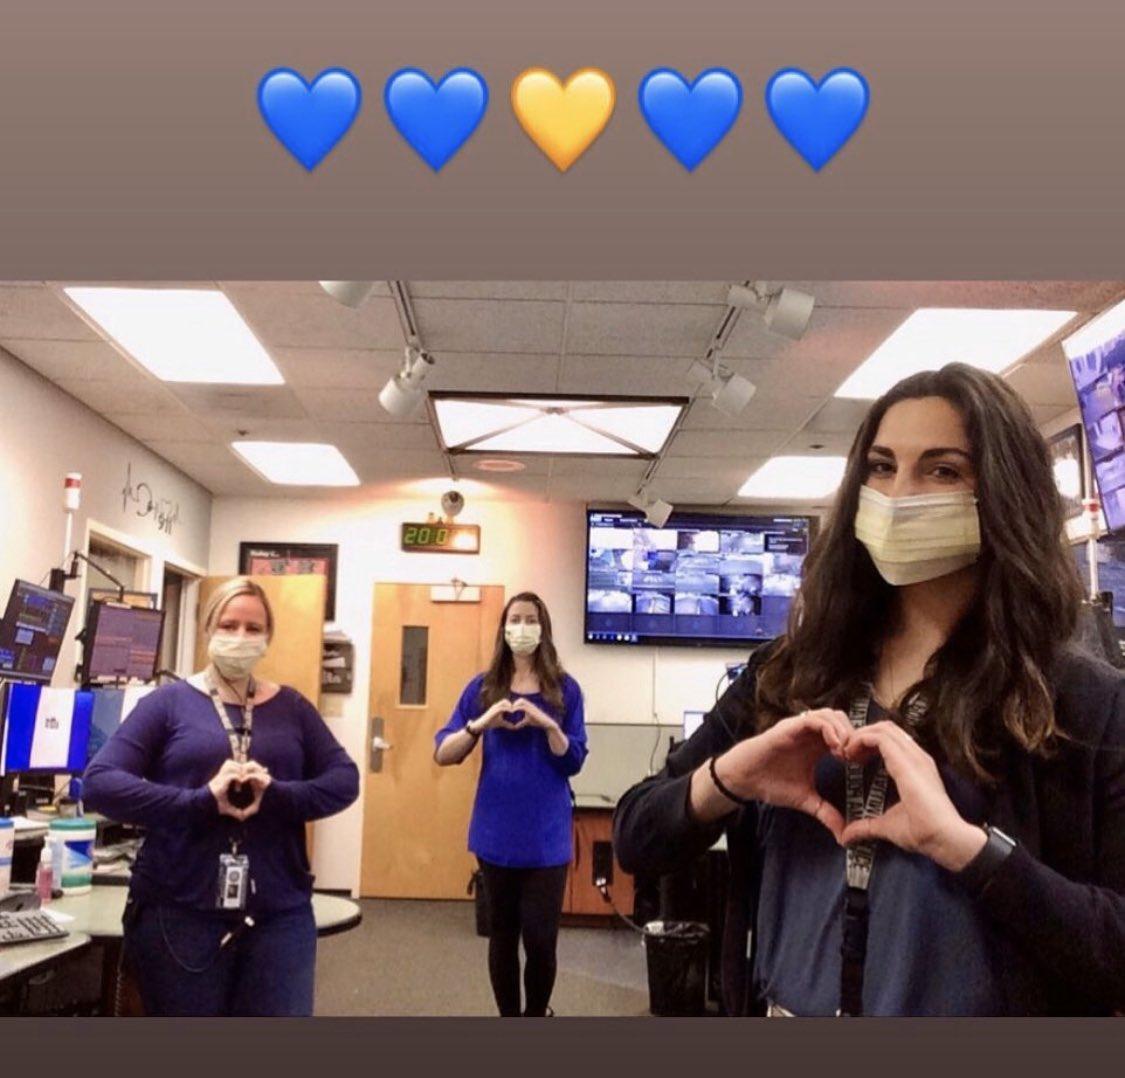 Yesterday our Dispatchers wore #BlueForMarylou #ppddispatch #RIPMarylou #thinblueline #petalumapolice #santarosapolice #petalumaproudpic.twitter.com/Xn2RHTU9Ui